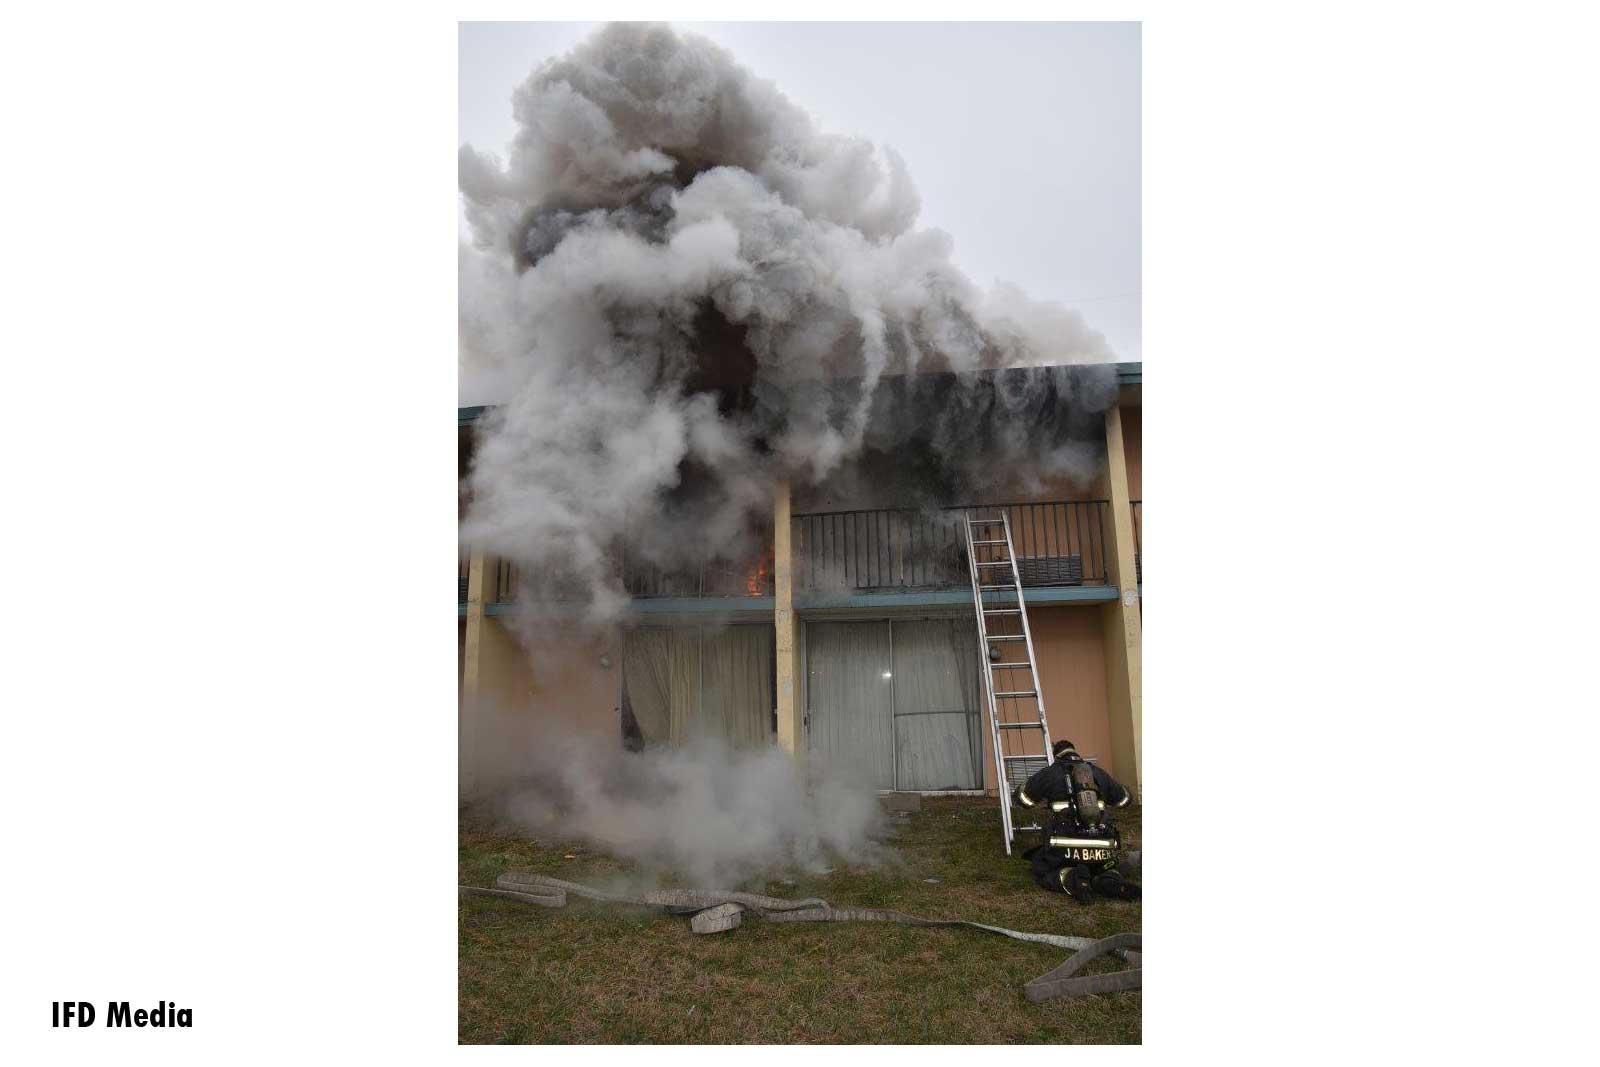 Billowing grey smoke and ground ladder